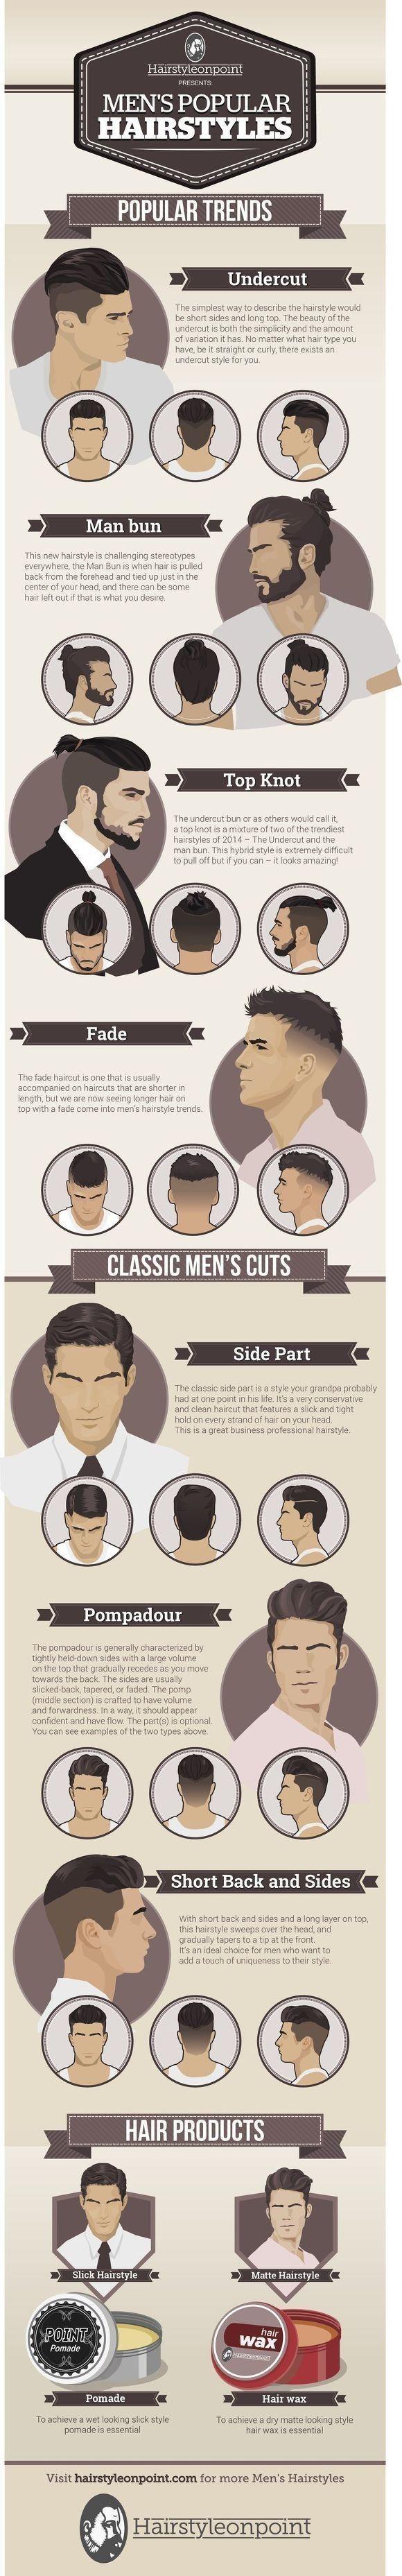 Oblong face haircut men 남자 머리 투블럭류 바리에이션  인스티즈  hairstyles  pinterest